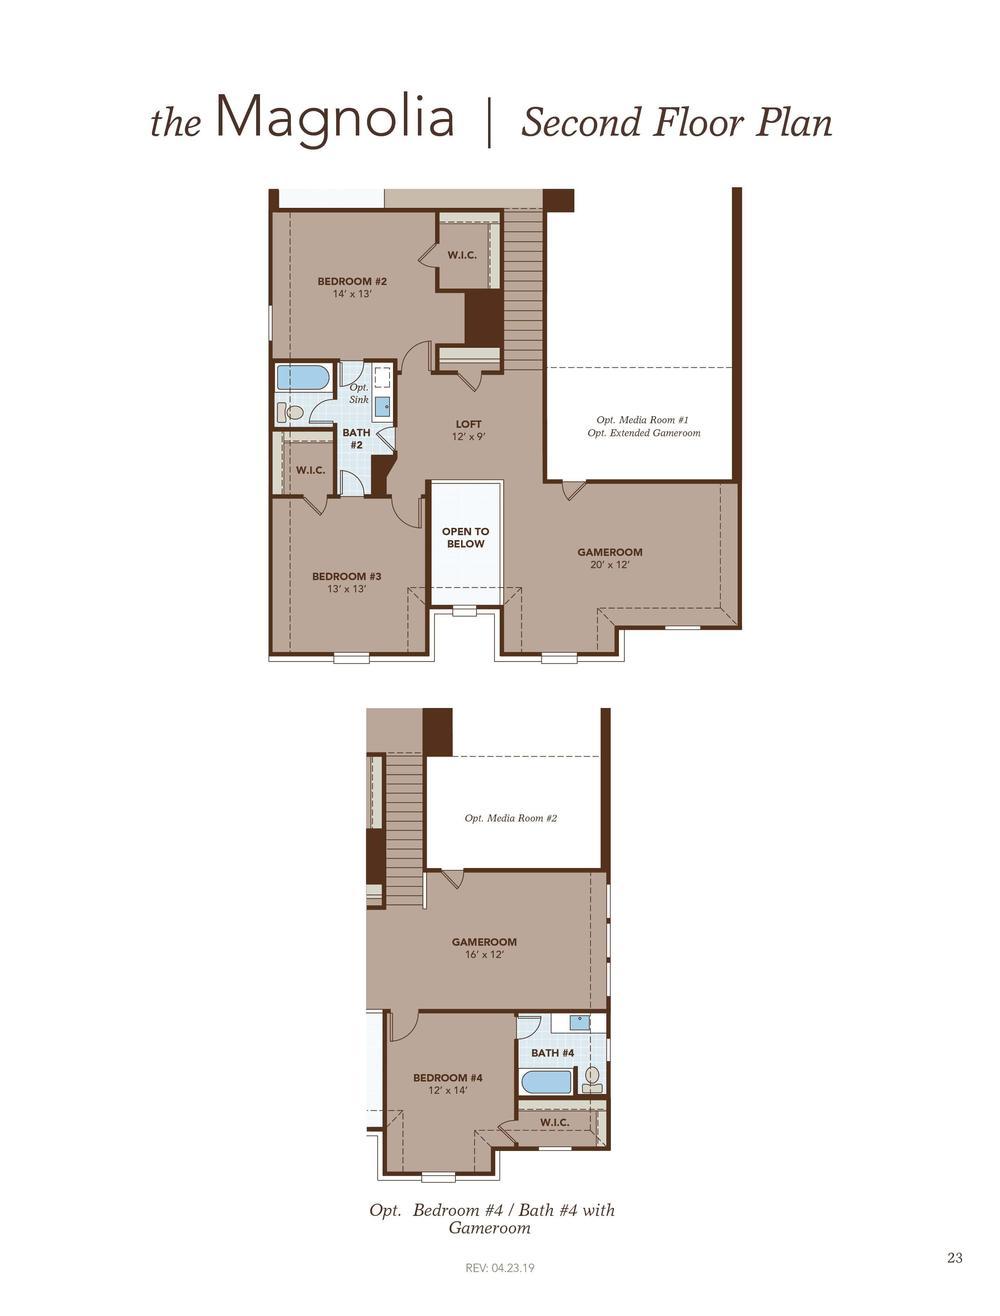 Magnolia Second Floor Plan